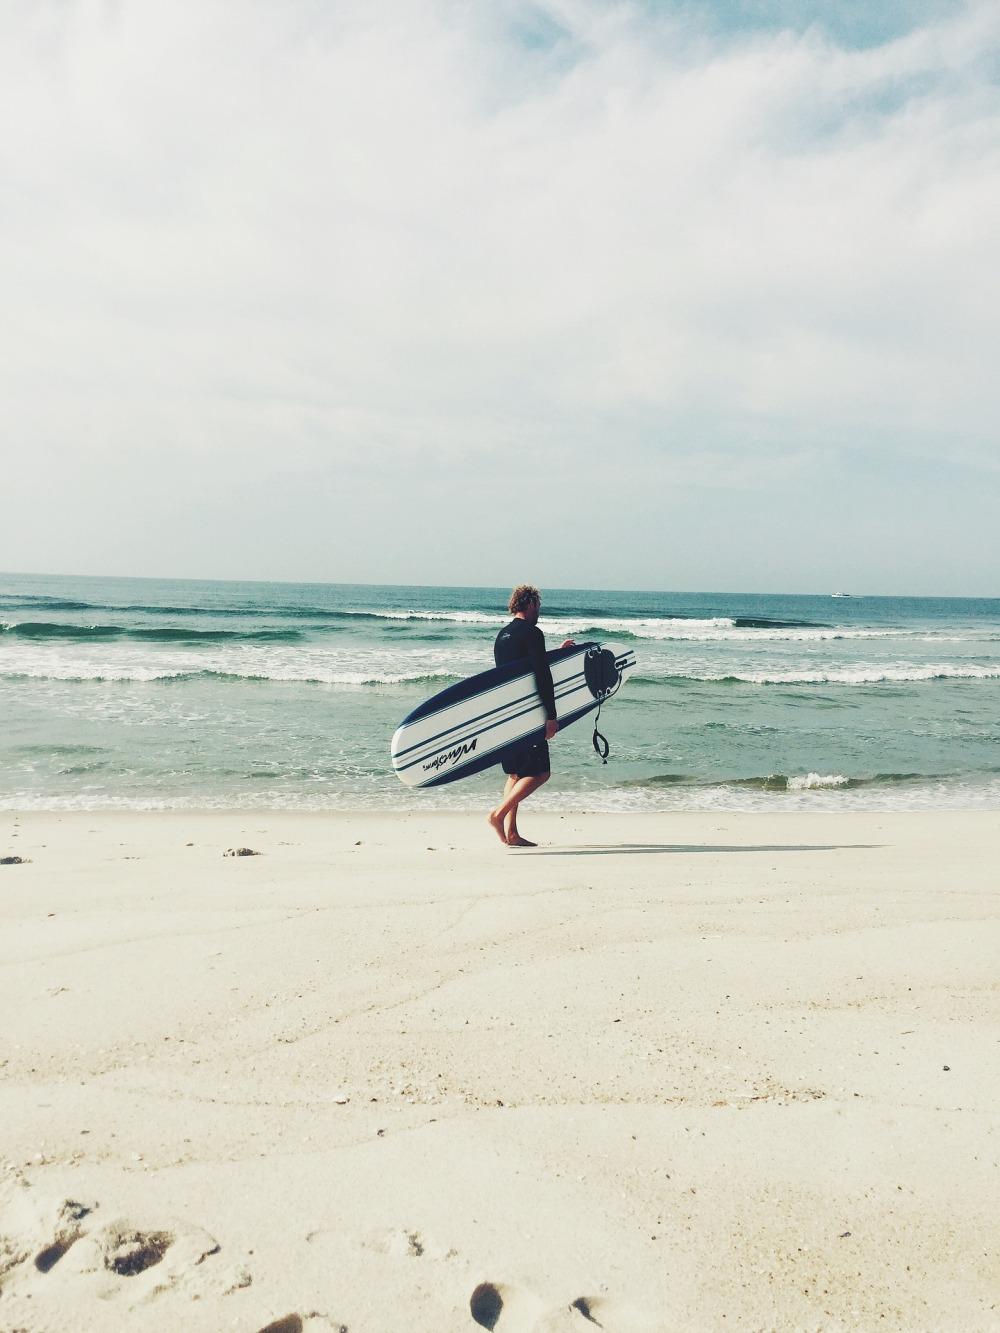 surf-869583_1920